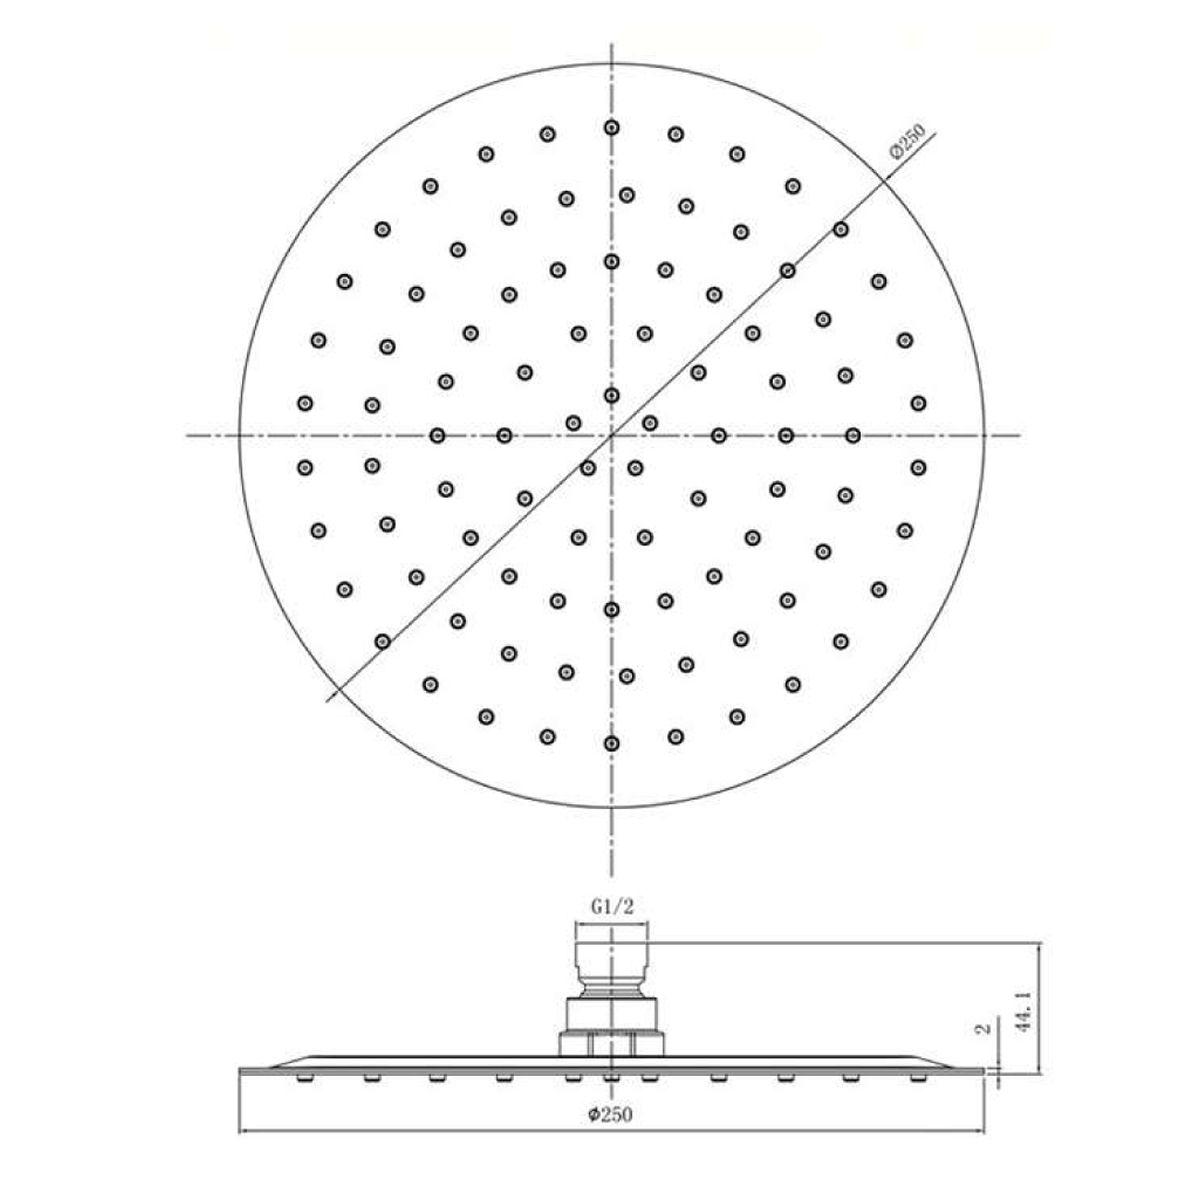 RAK Chrome Round Ultra Slim Air Induction Shower Head 250mm Measurements